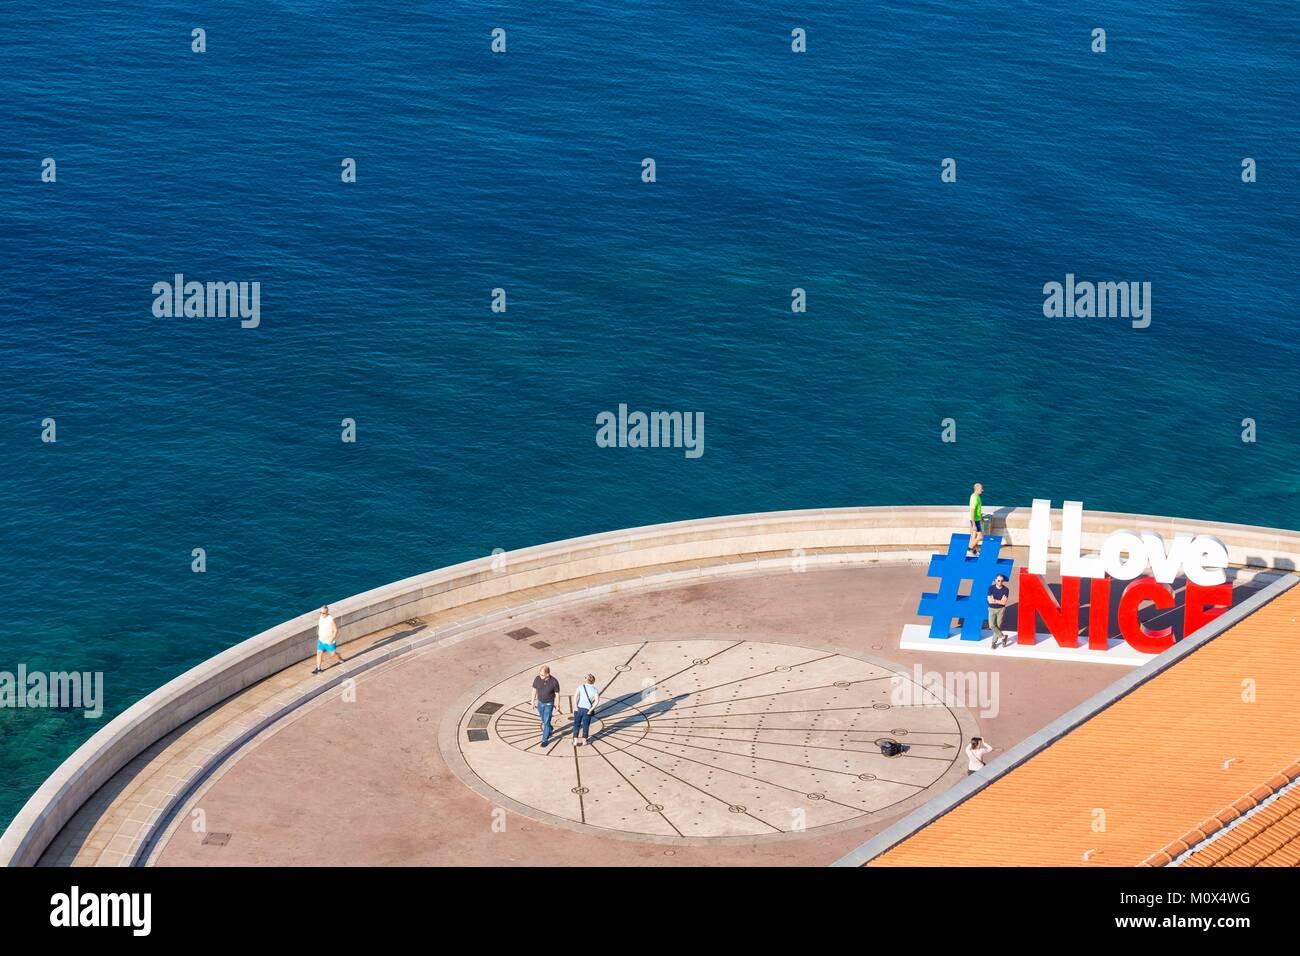 France,Alpes Maritimes,Nice,Pointe des Ponchettes,quai Rauba Capeu,sundial - Stock Image